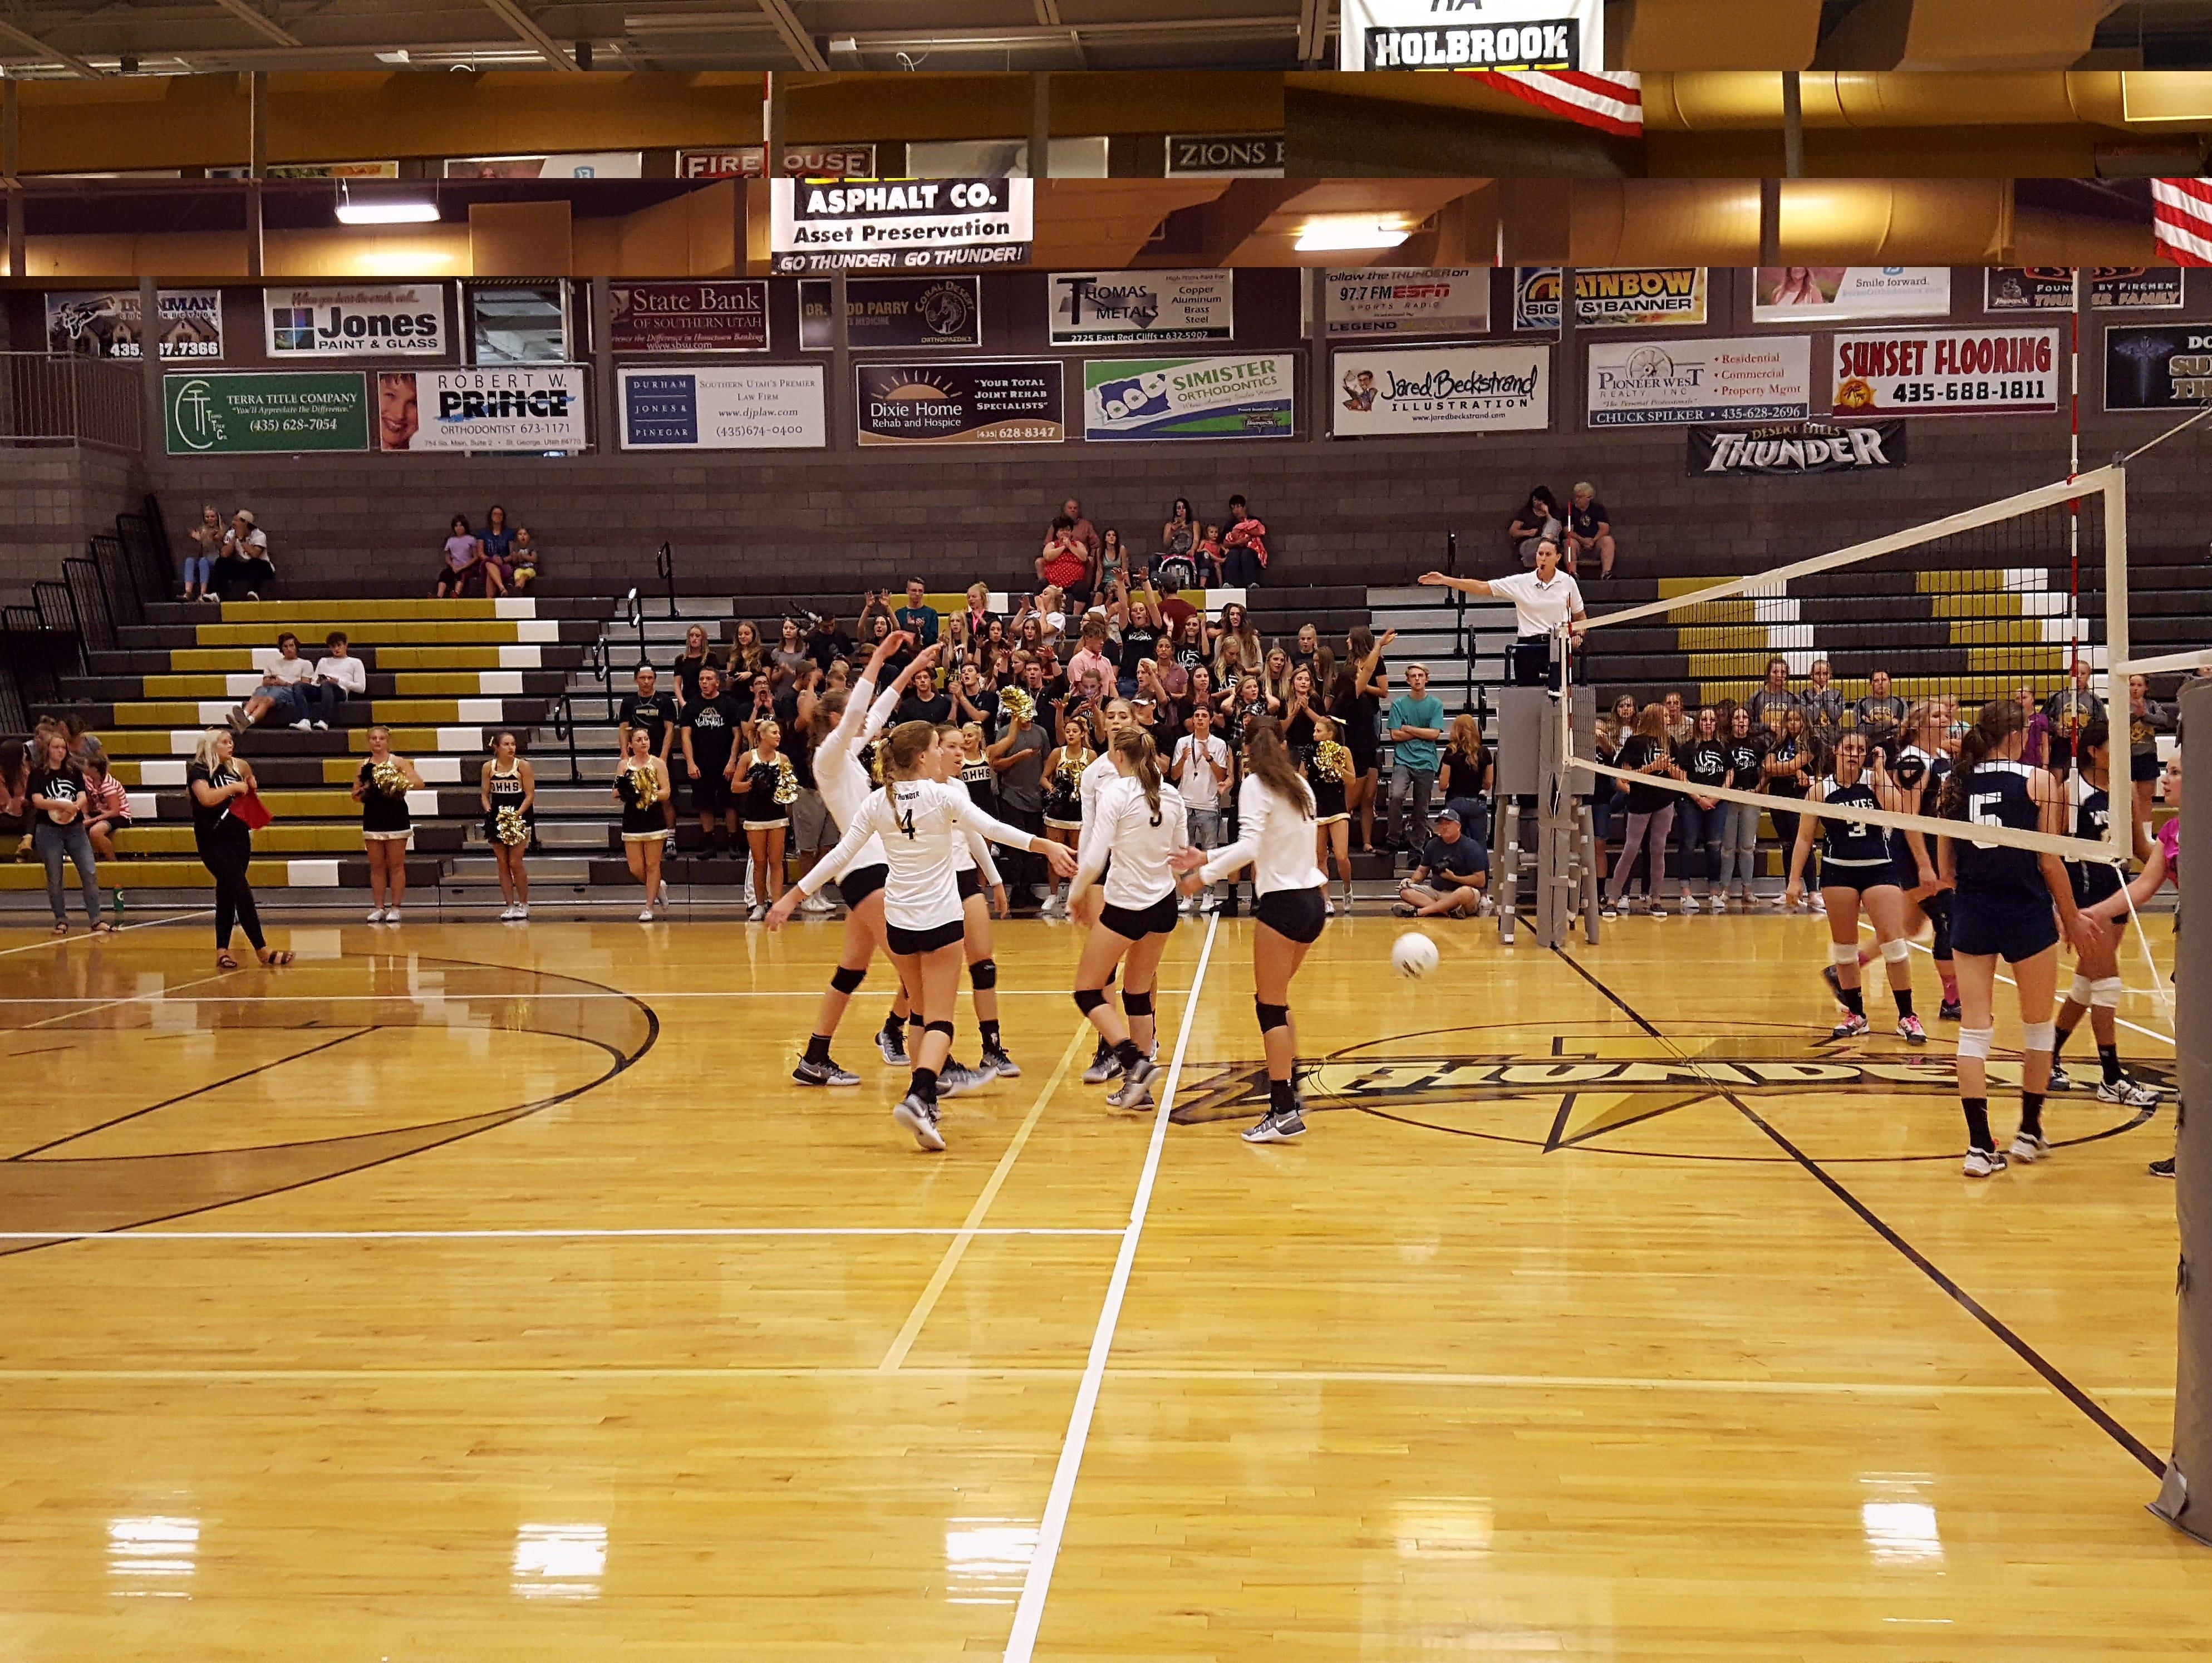 Desert Hills celebrates winning a point Thursday, August 25, 2016